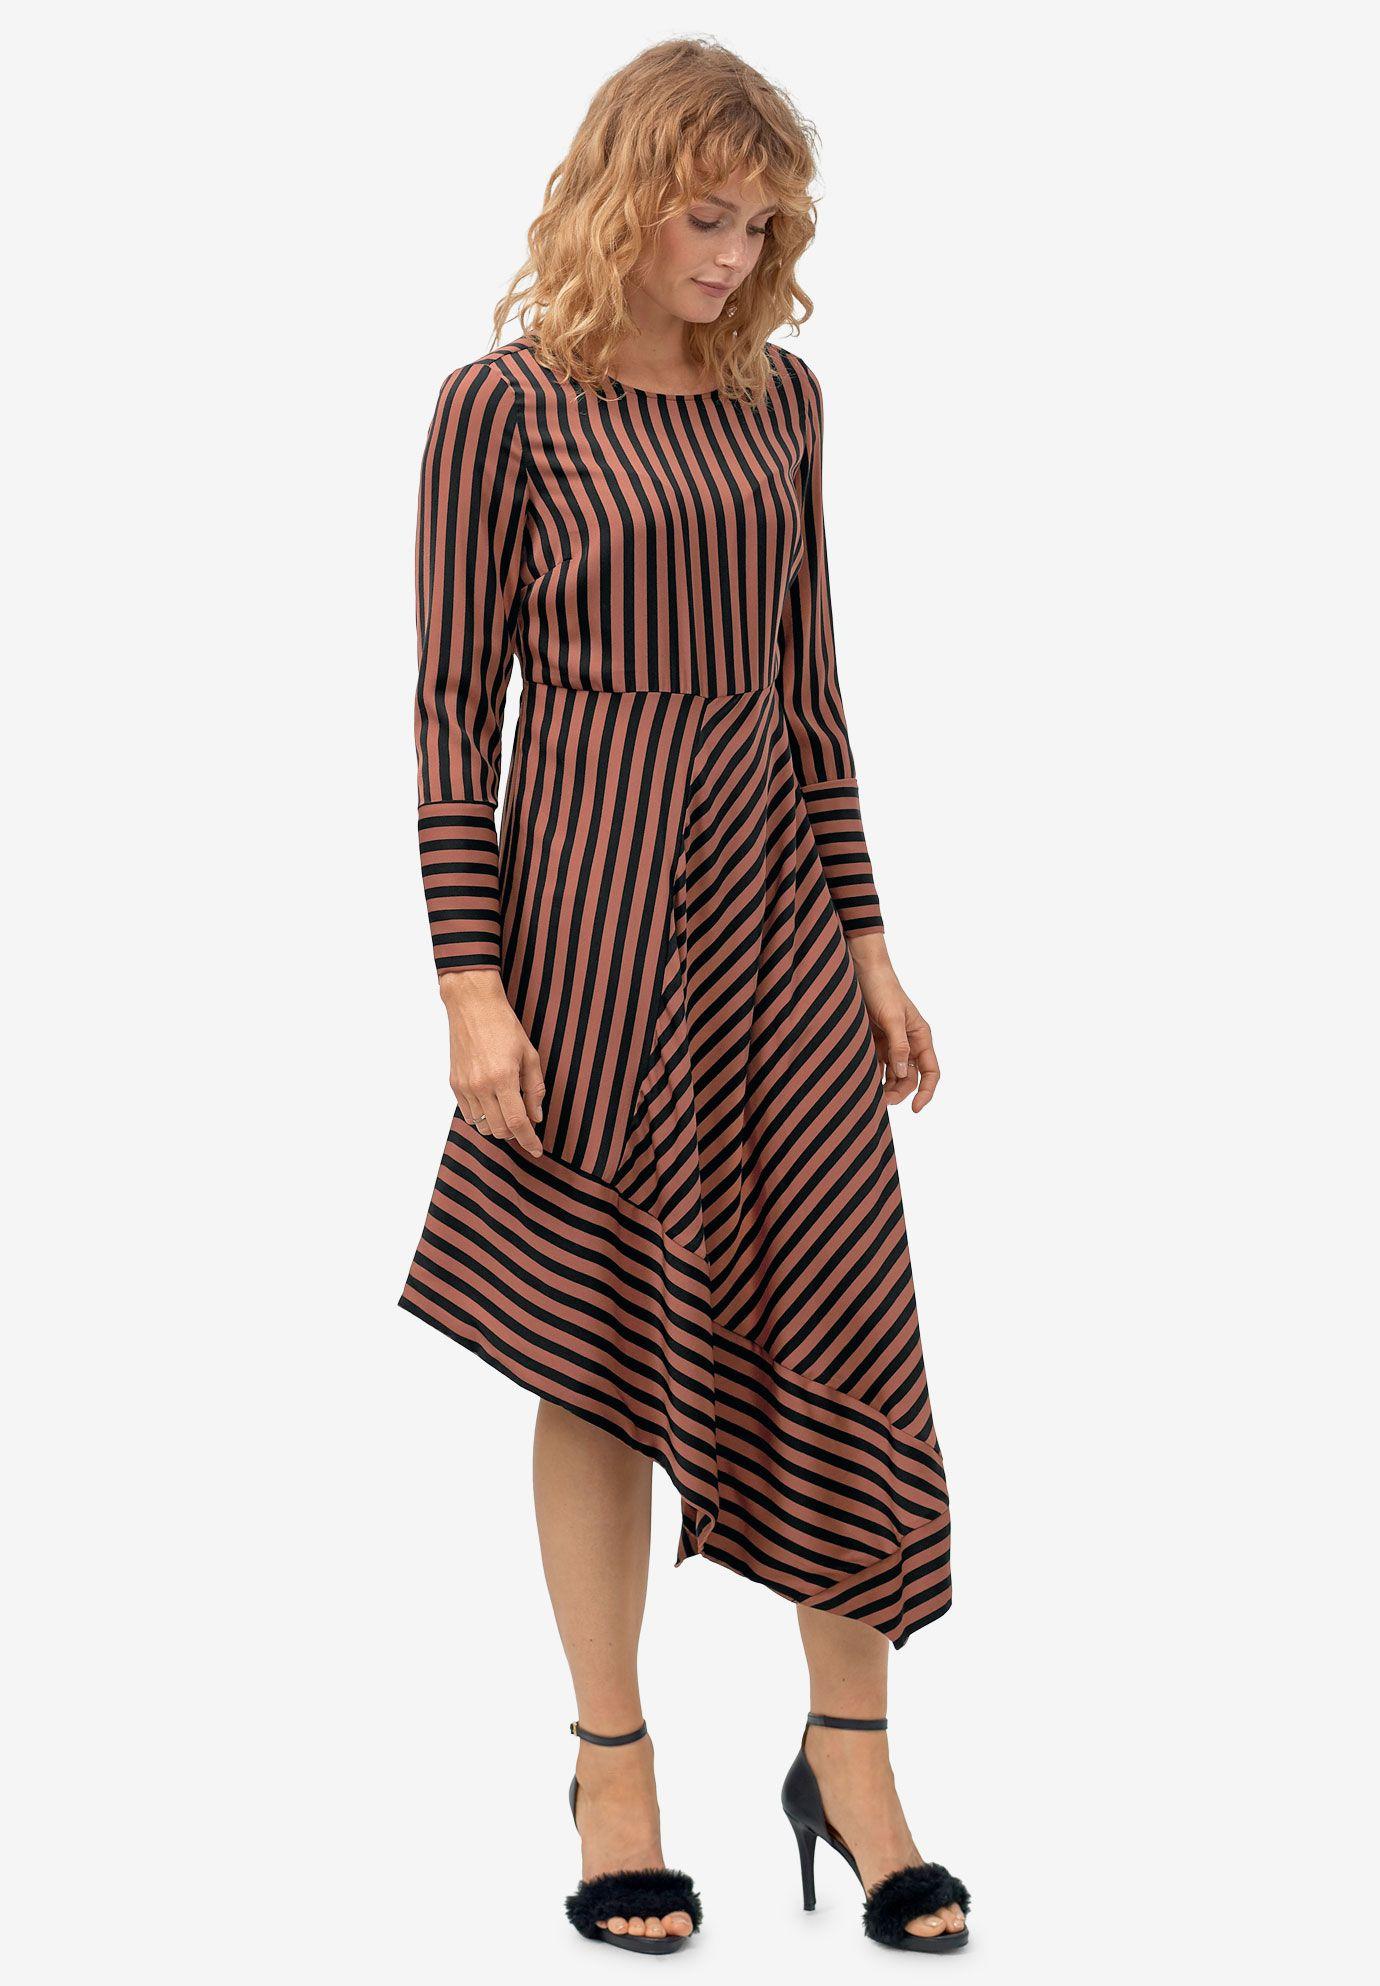 Asymmetrical Striped Dress By Ellos Striped Dress Dresses Casual Dresses [ 1986 x 1380 Pixel ]